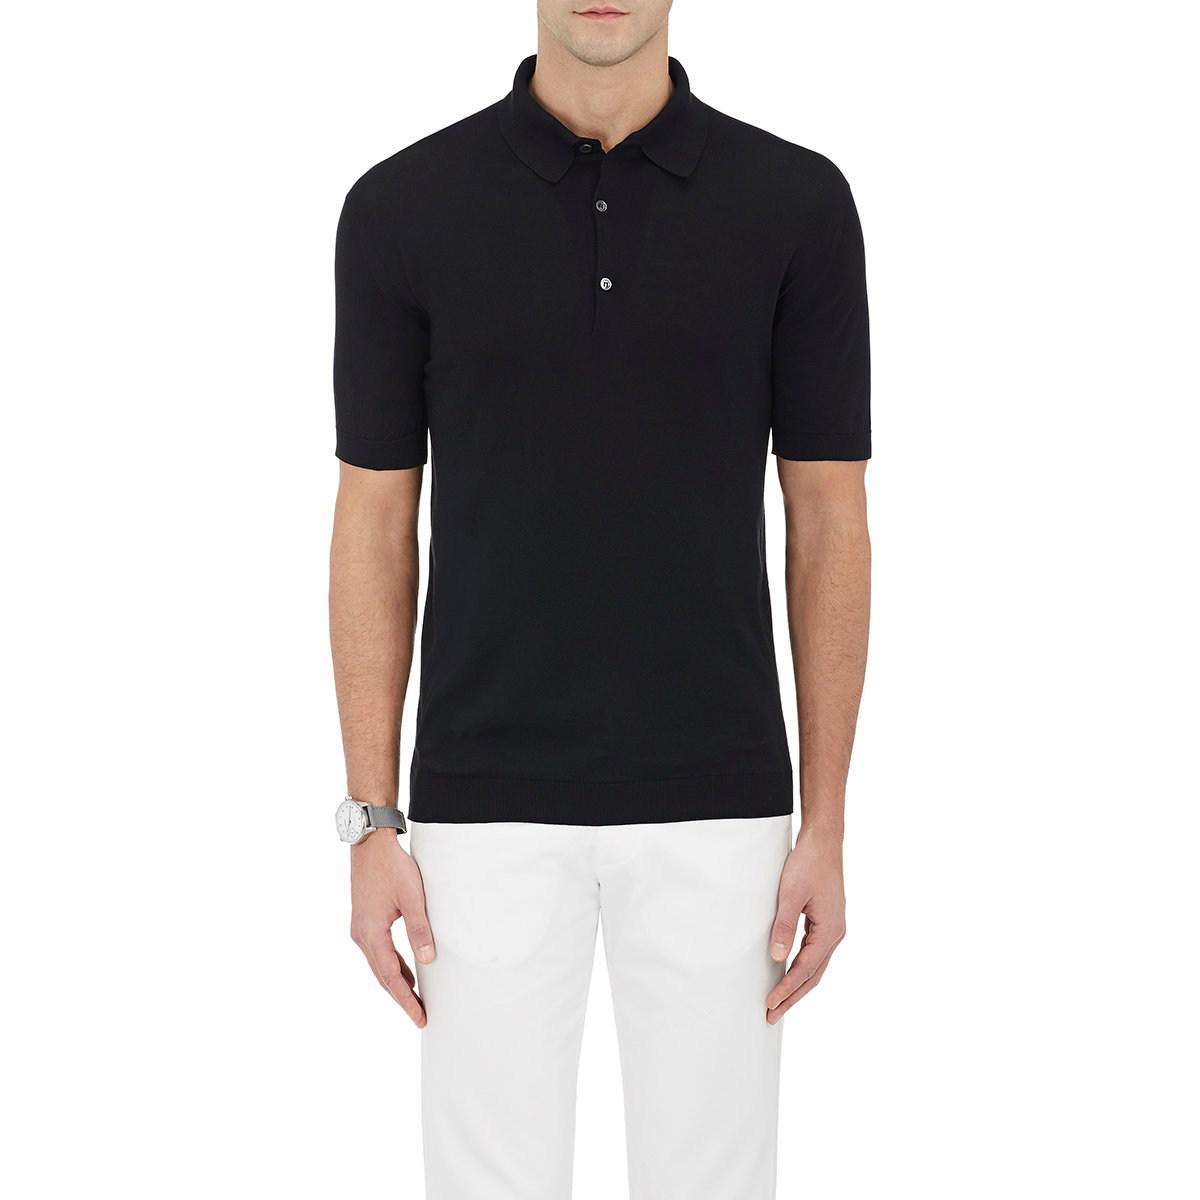 177664fd Lyst - John Smedley Cotton Polo Shirt in Black for Men